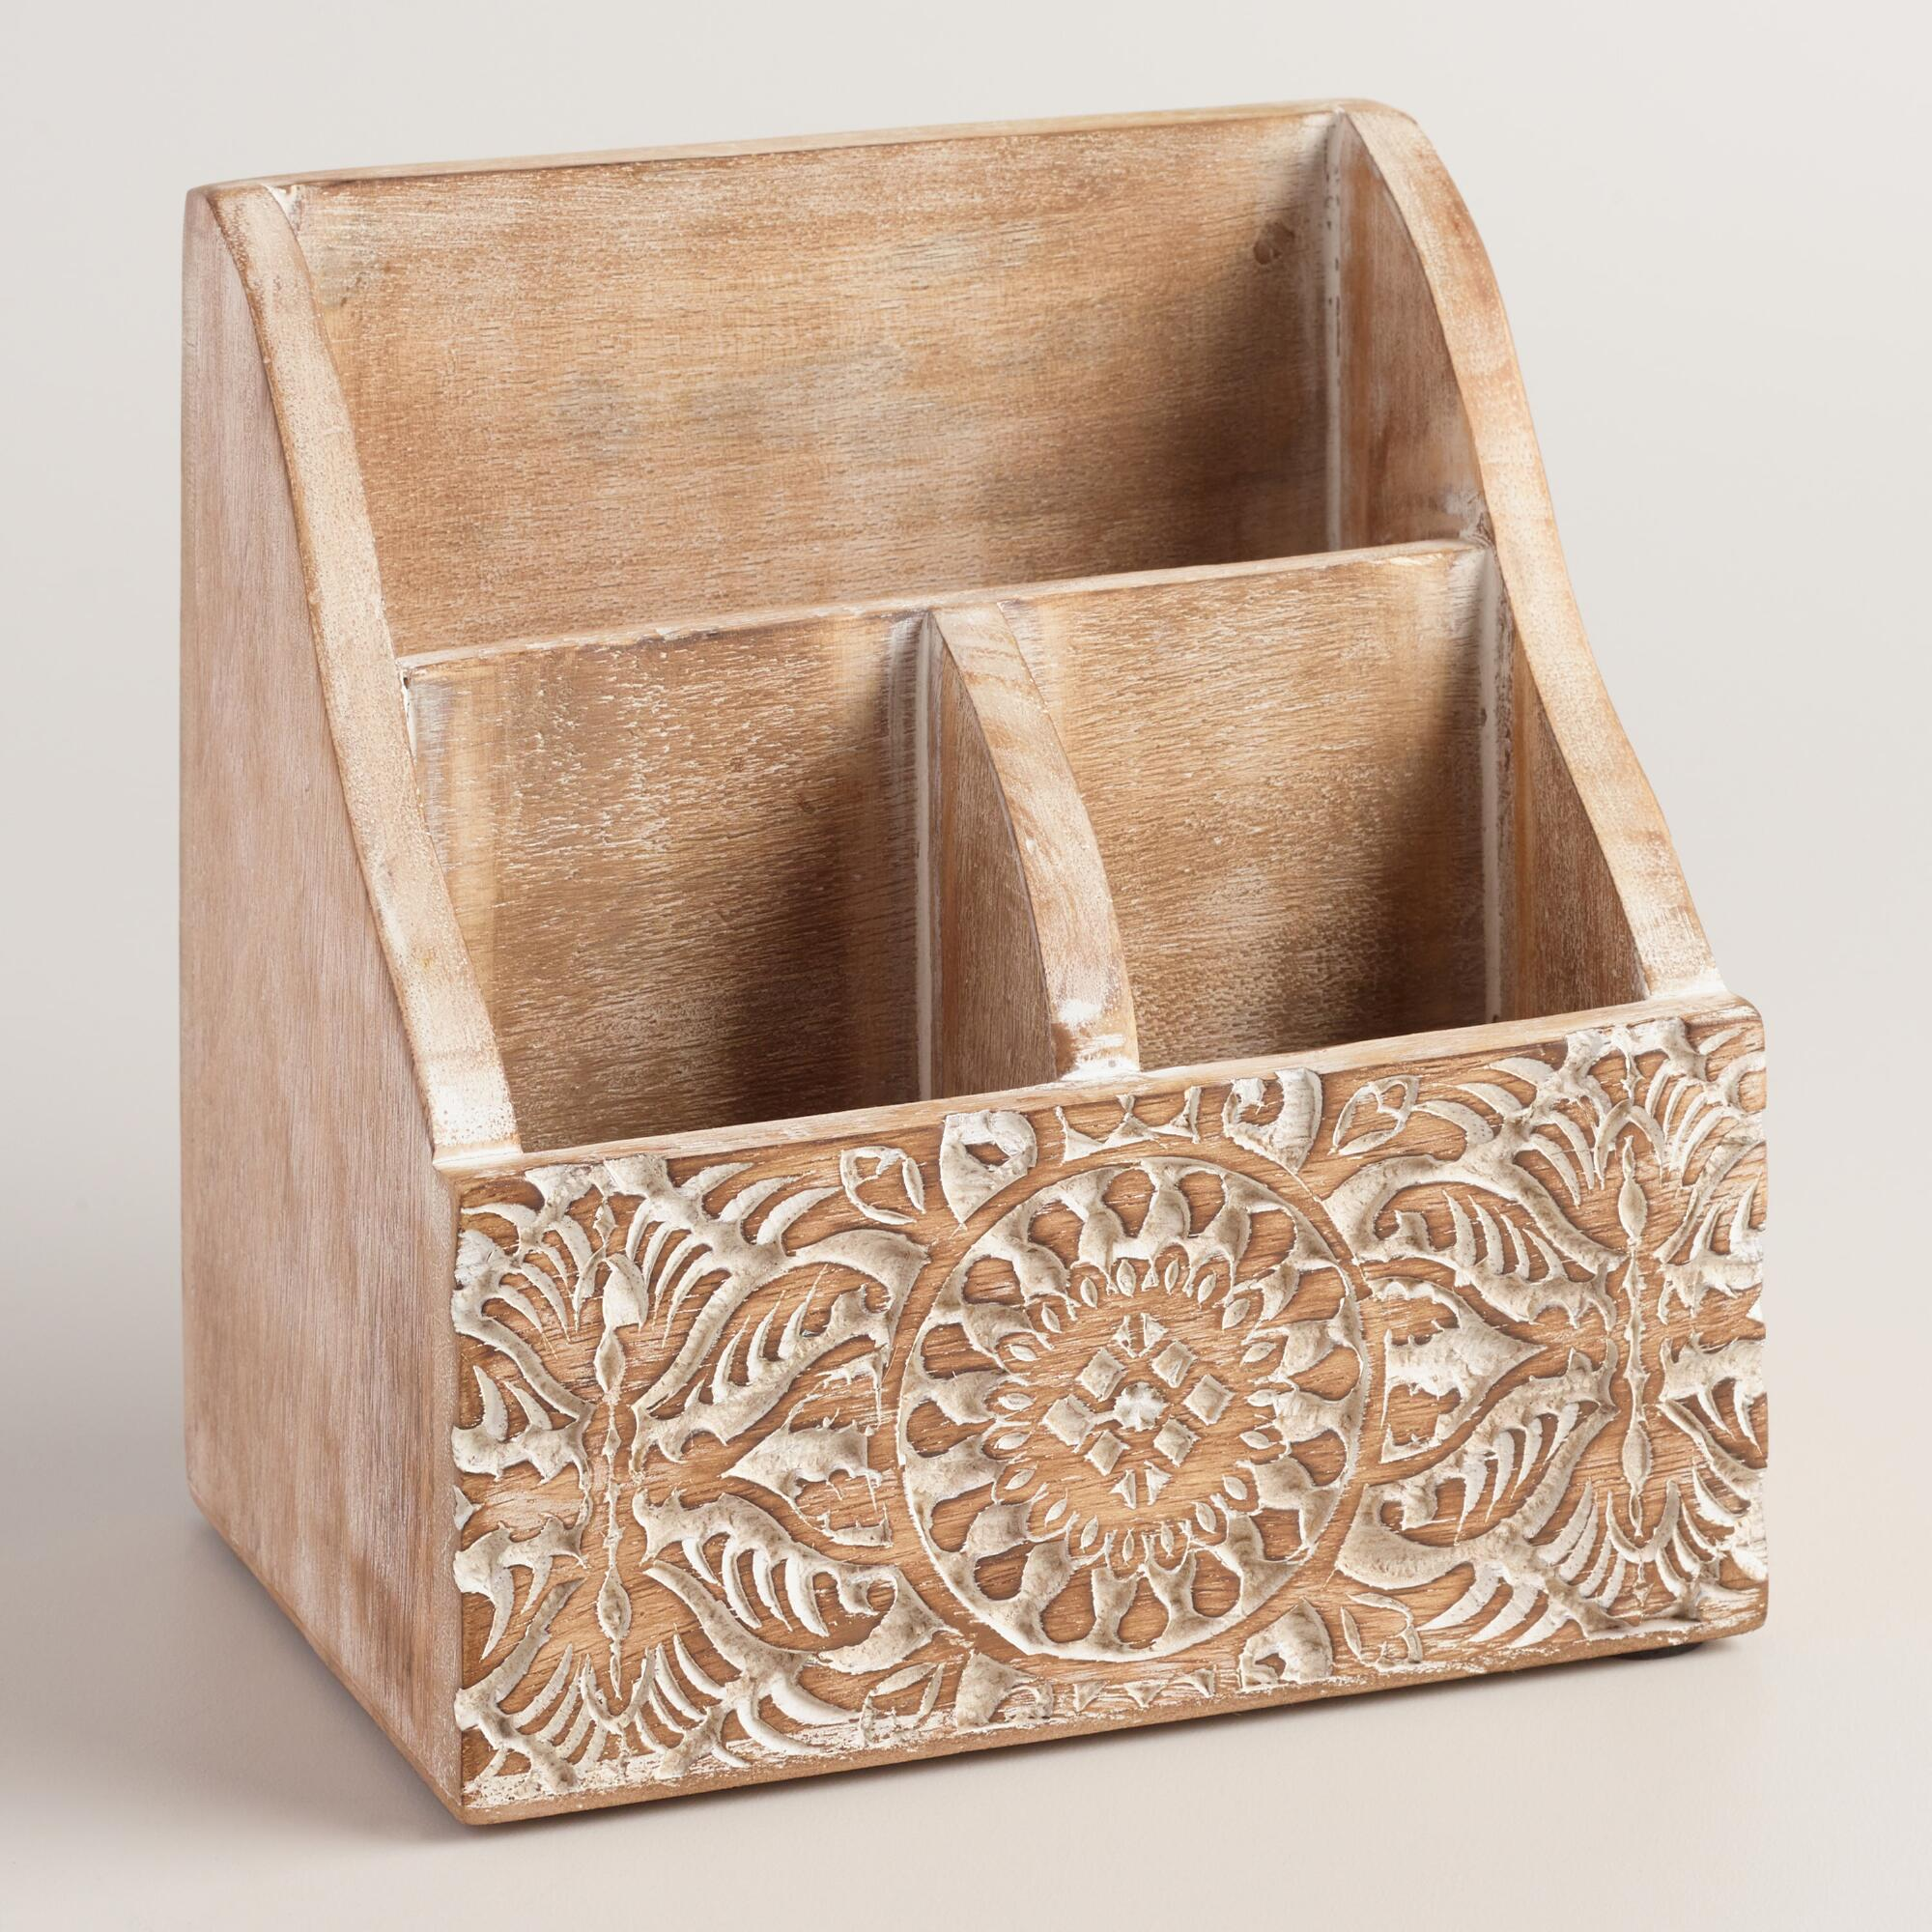 Mini Hand-Carved Wood Gianna Desk Organizer | World Market